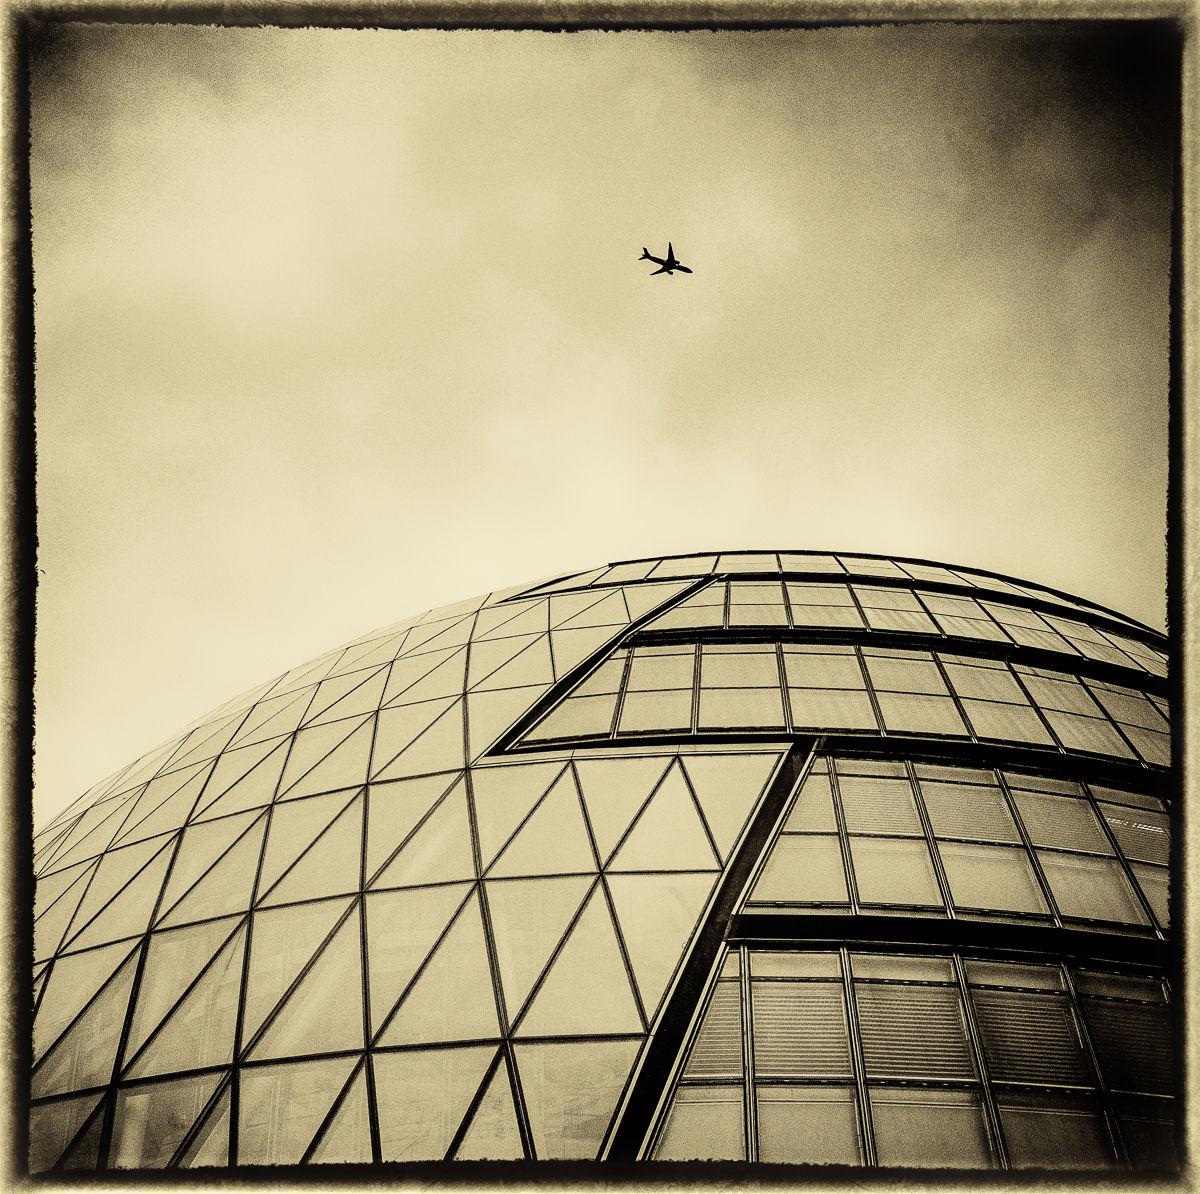 City Hall Flyover, London, UK